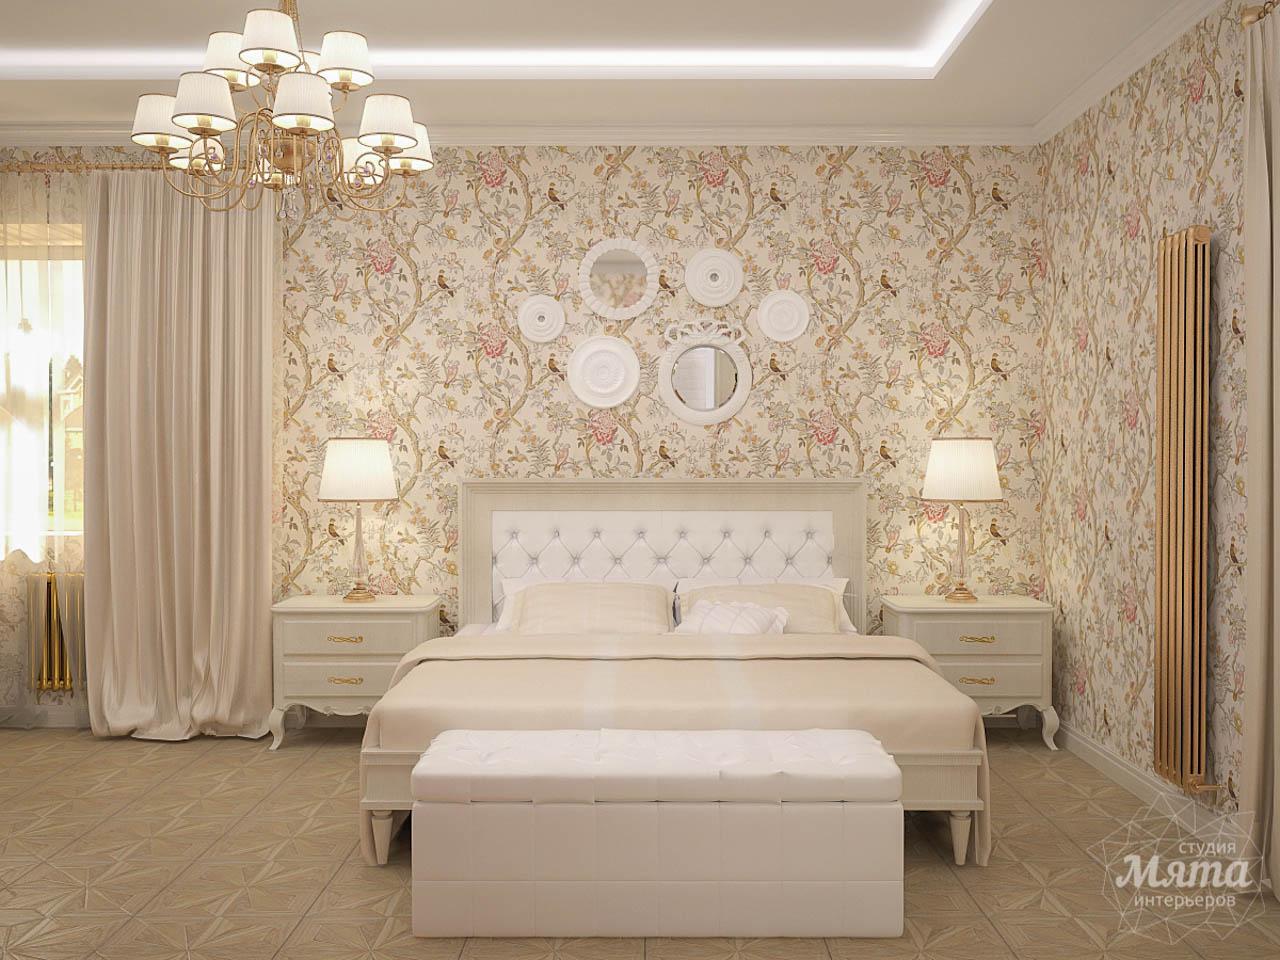 Дизайн интерьера коттеджа по ул. Ландышевая 23 img1105141907